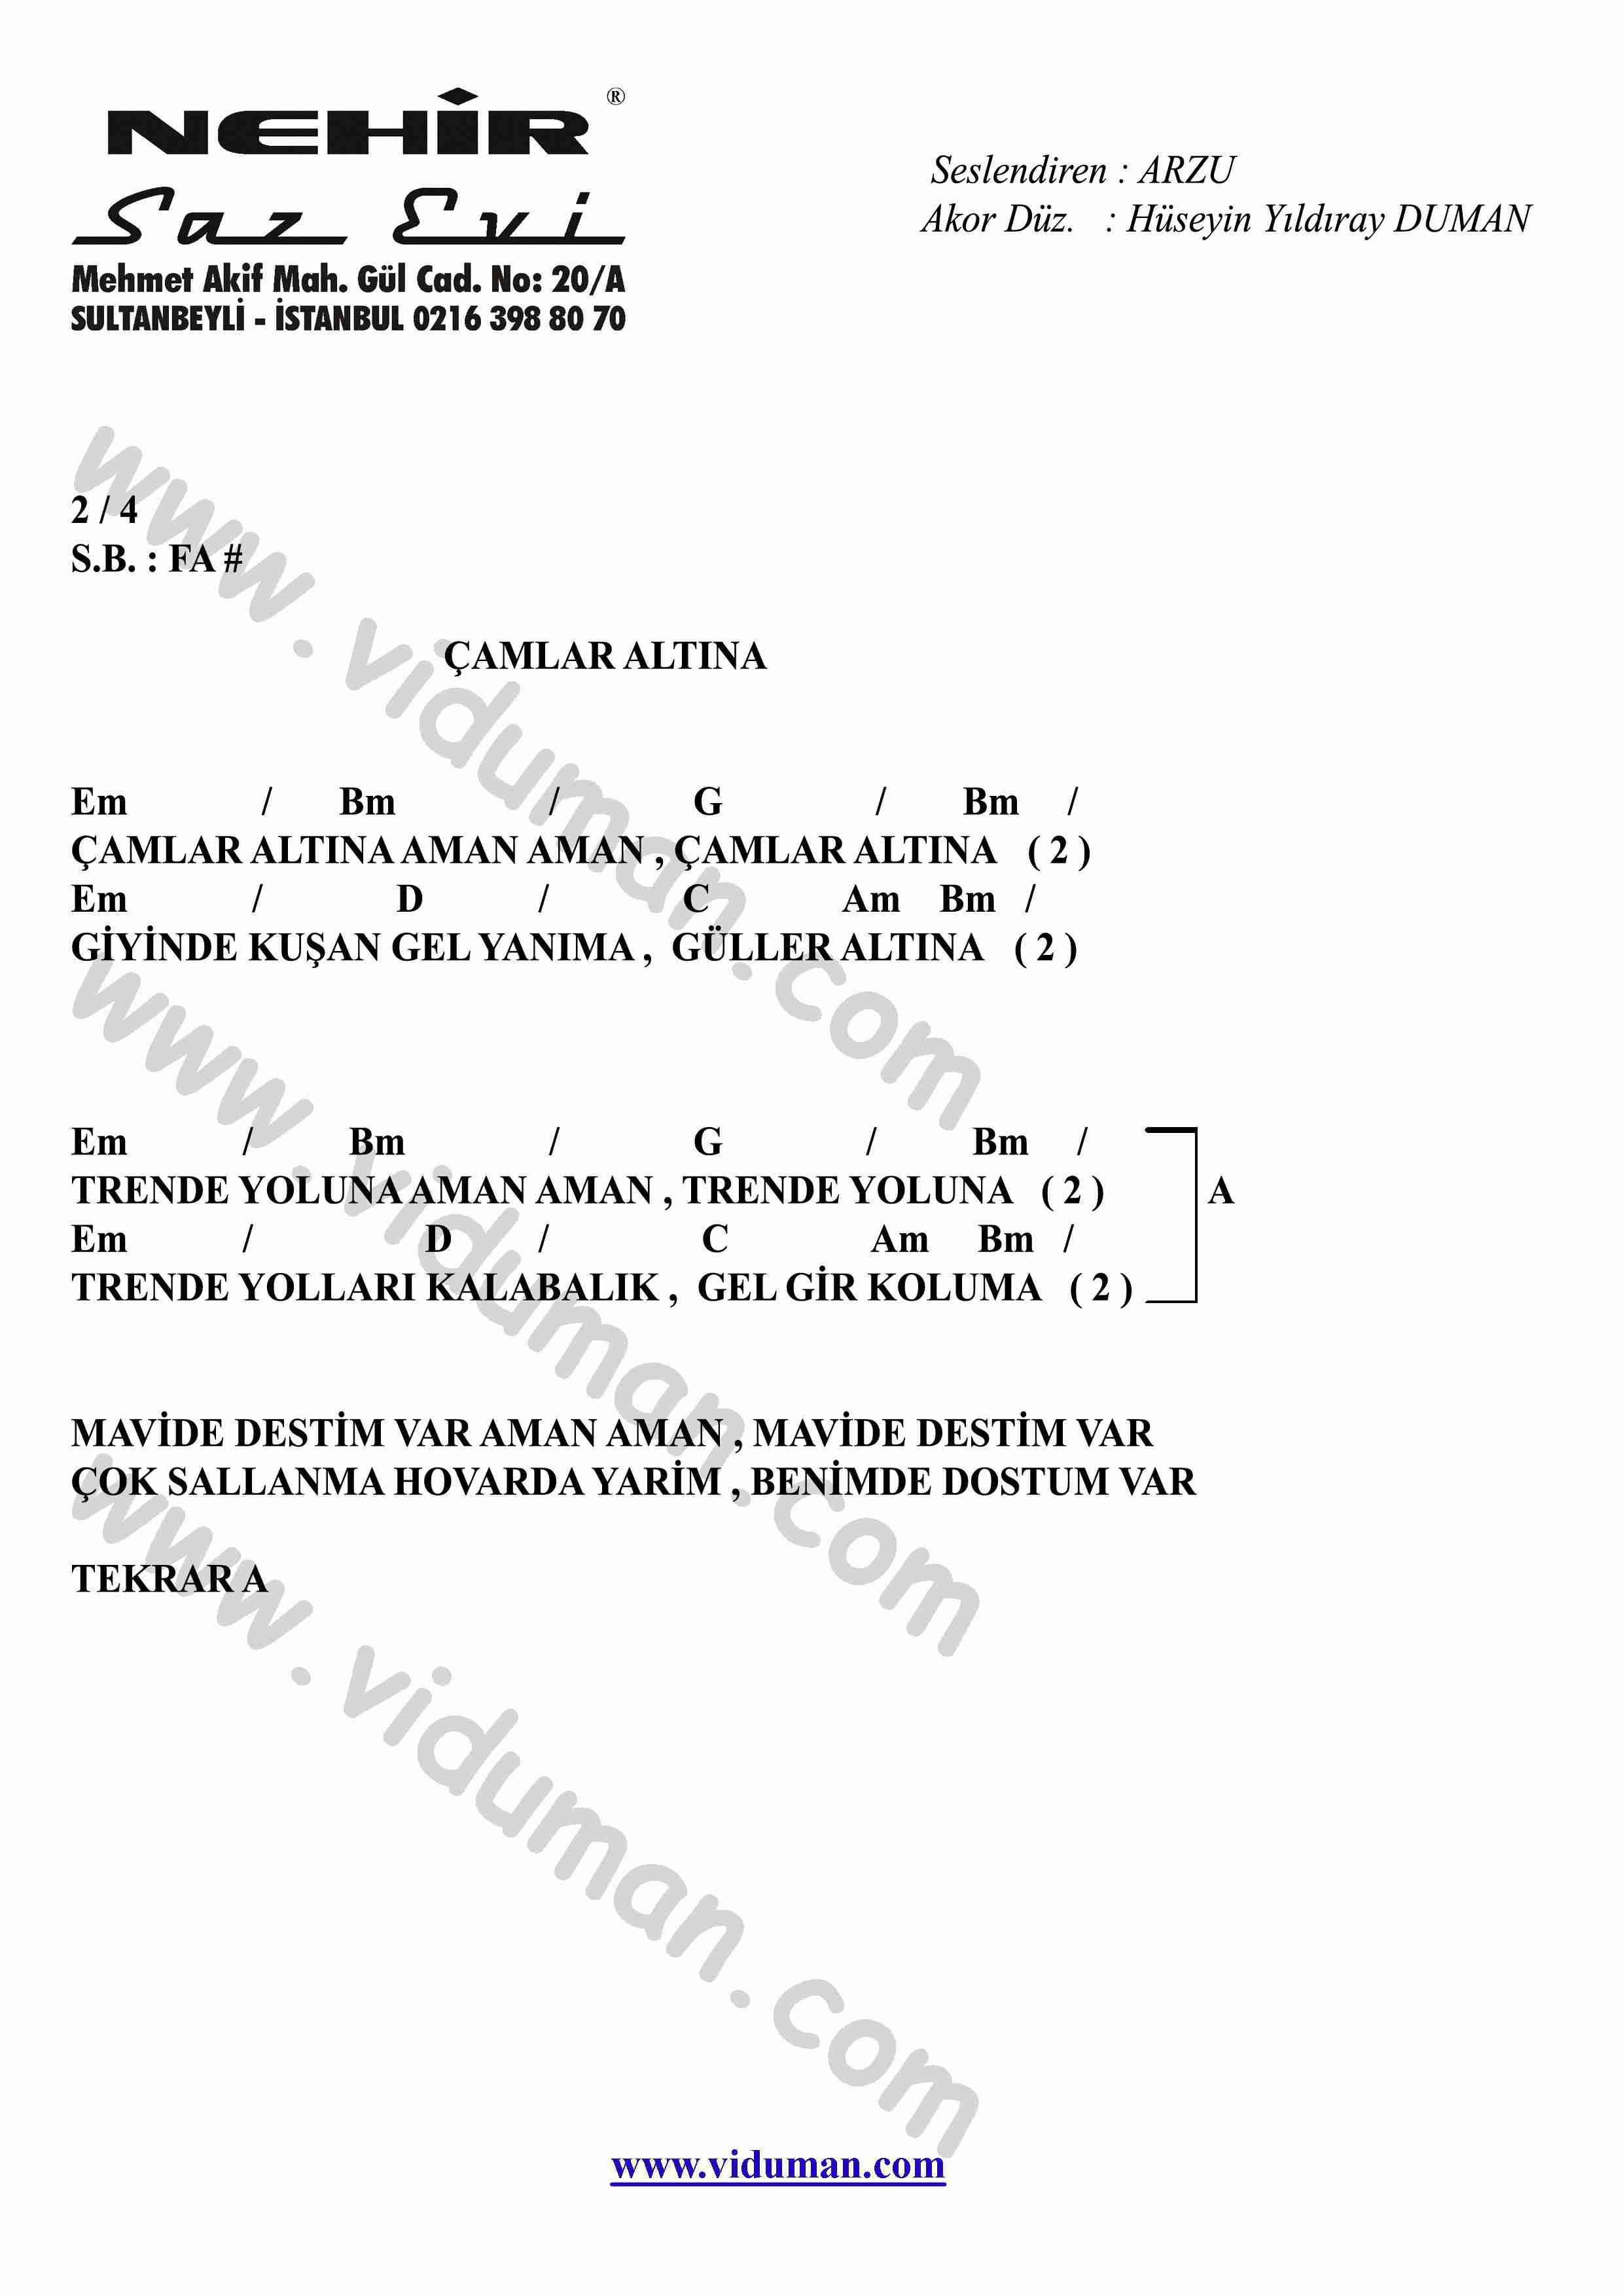 Camlar Altina-Gitar-Ritim-Akorlari